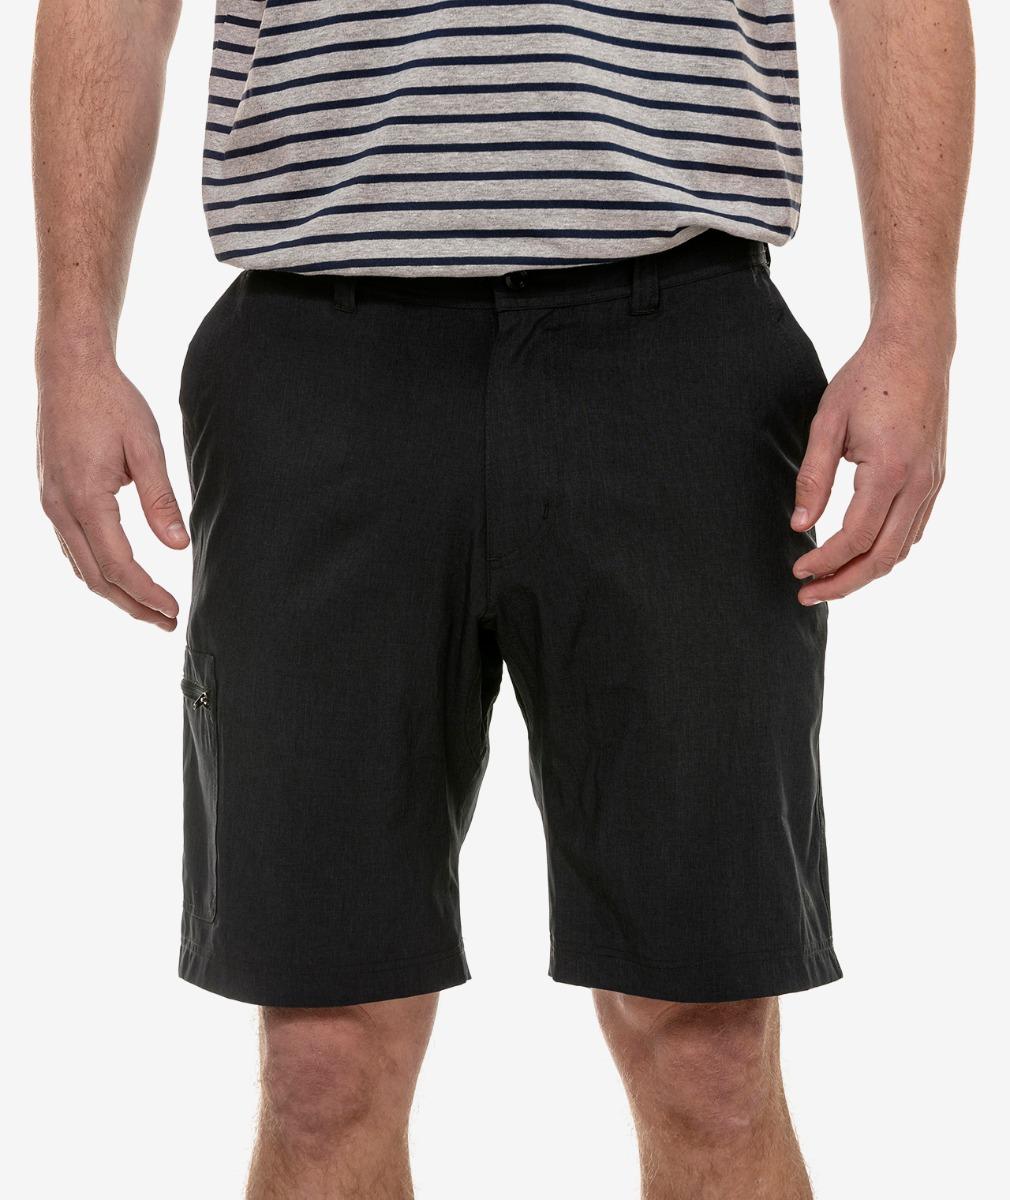 Swanndri Men's Mensa Technical Outdoor Shorts